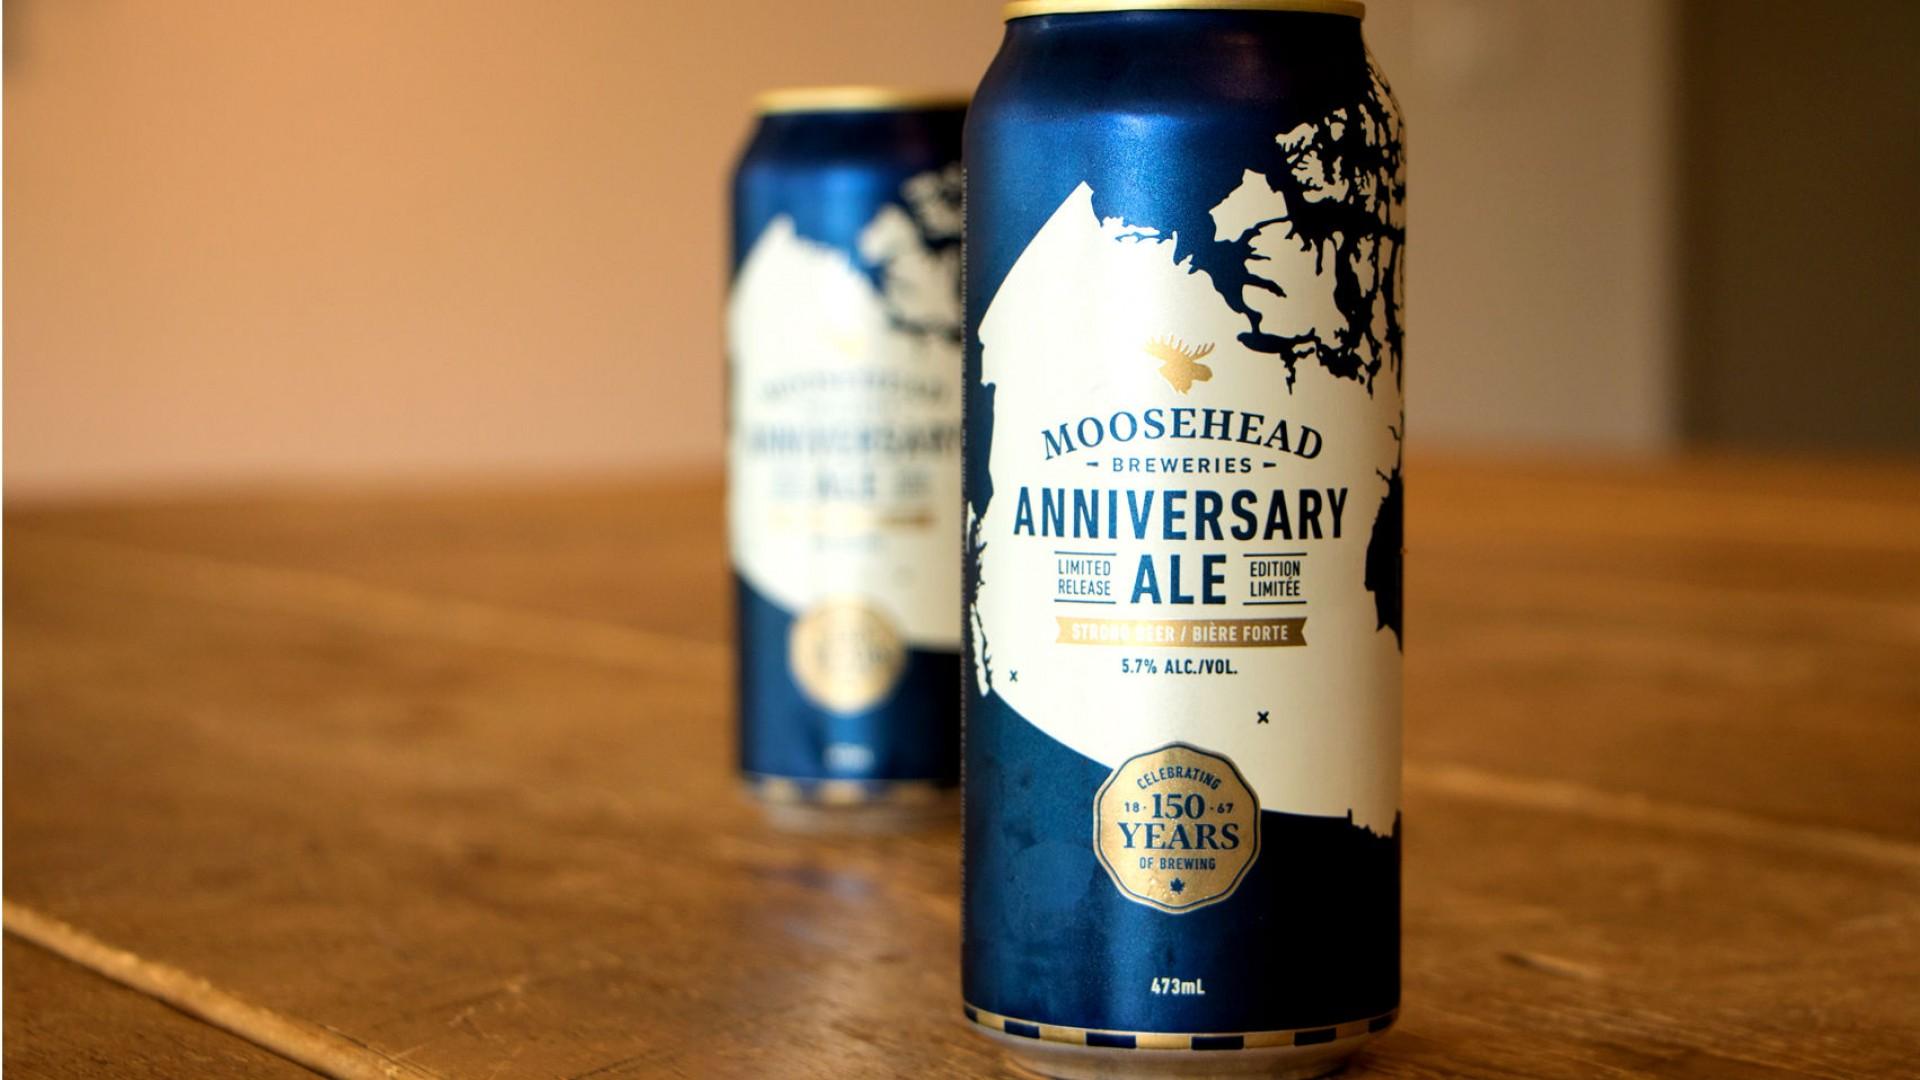 Moosehead Anniversary Ale